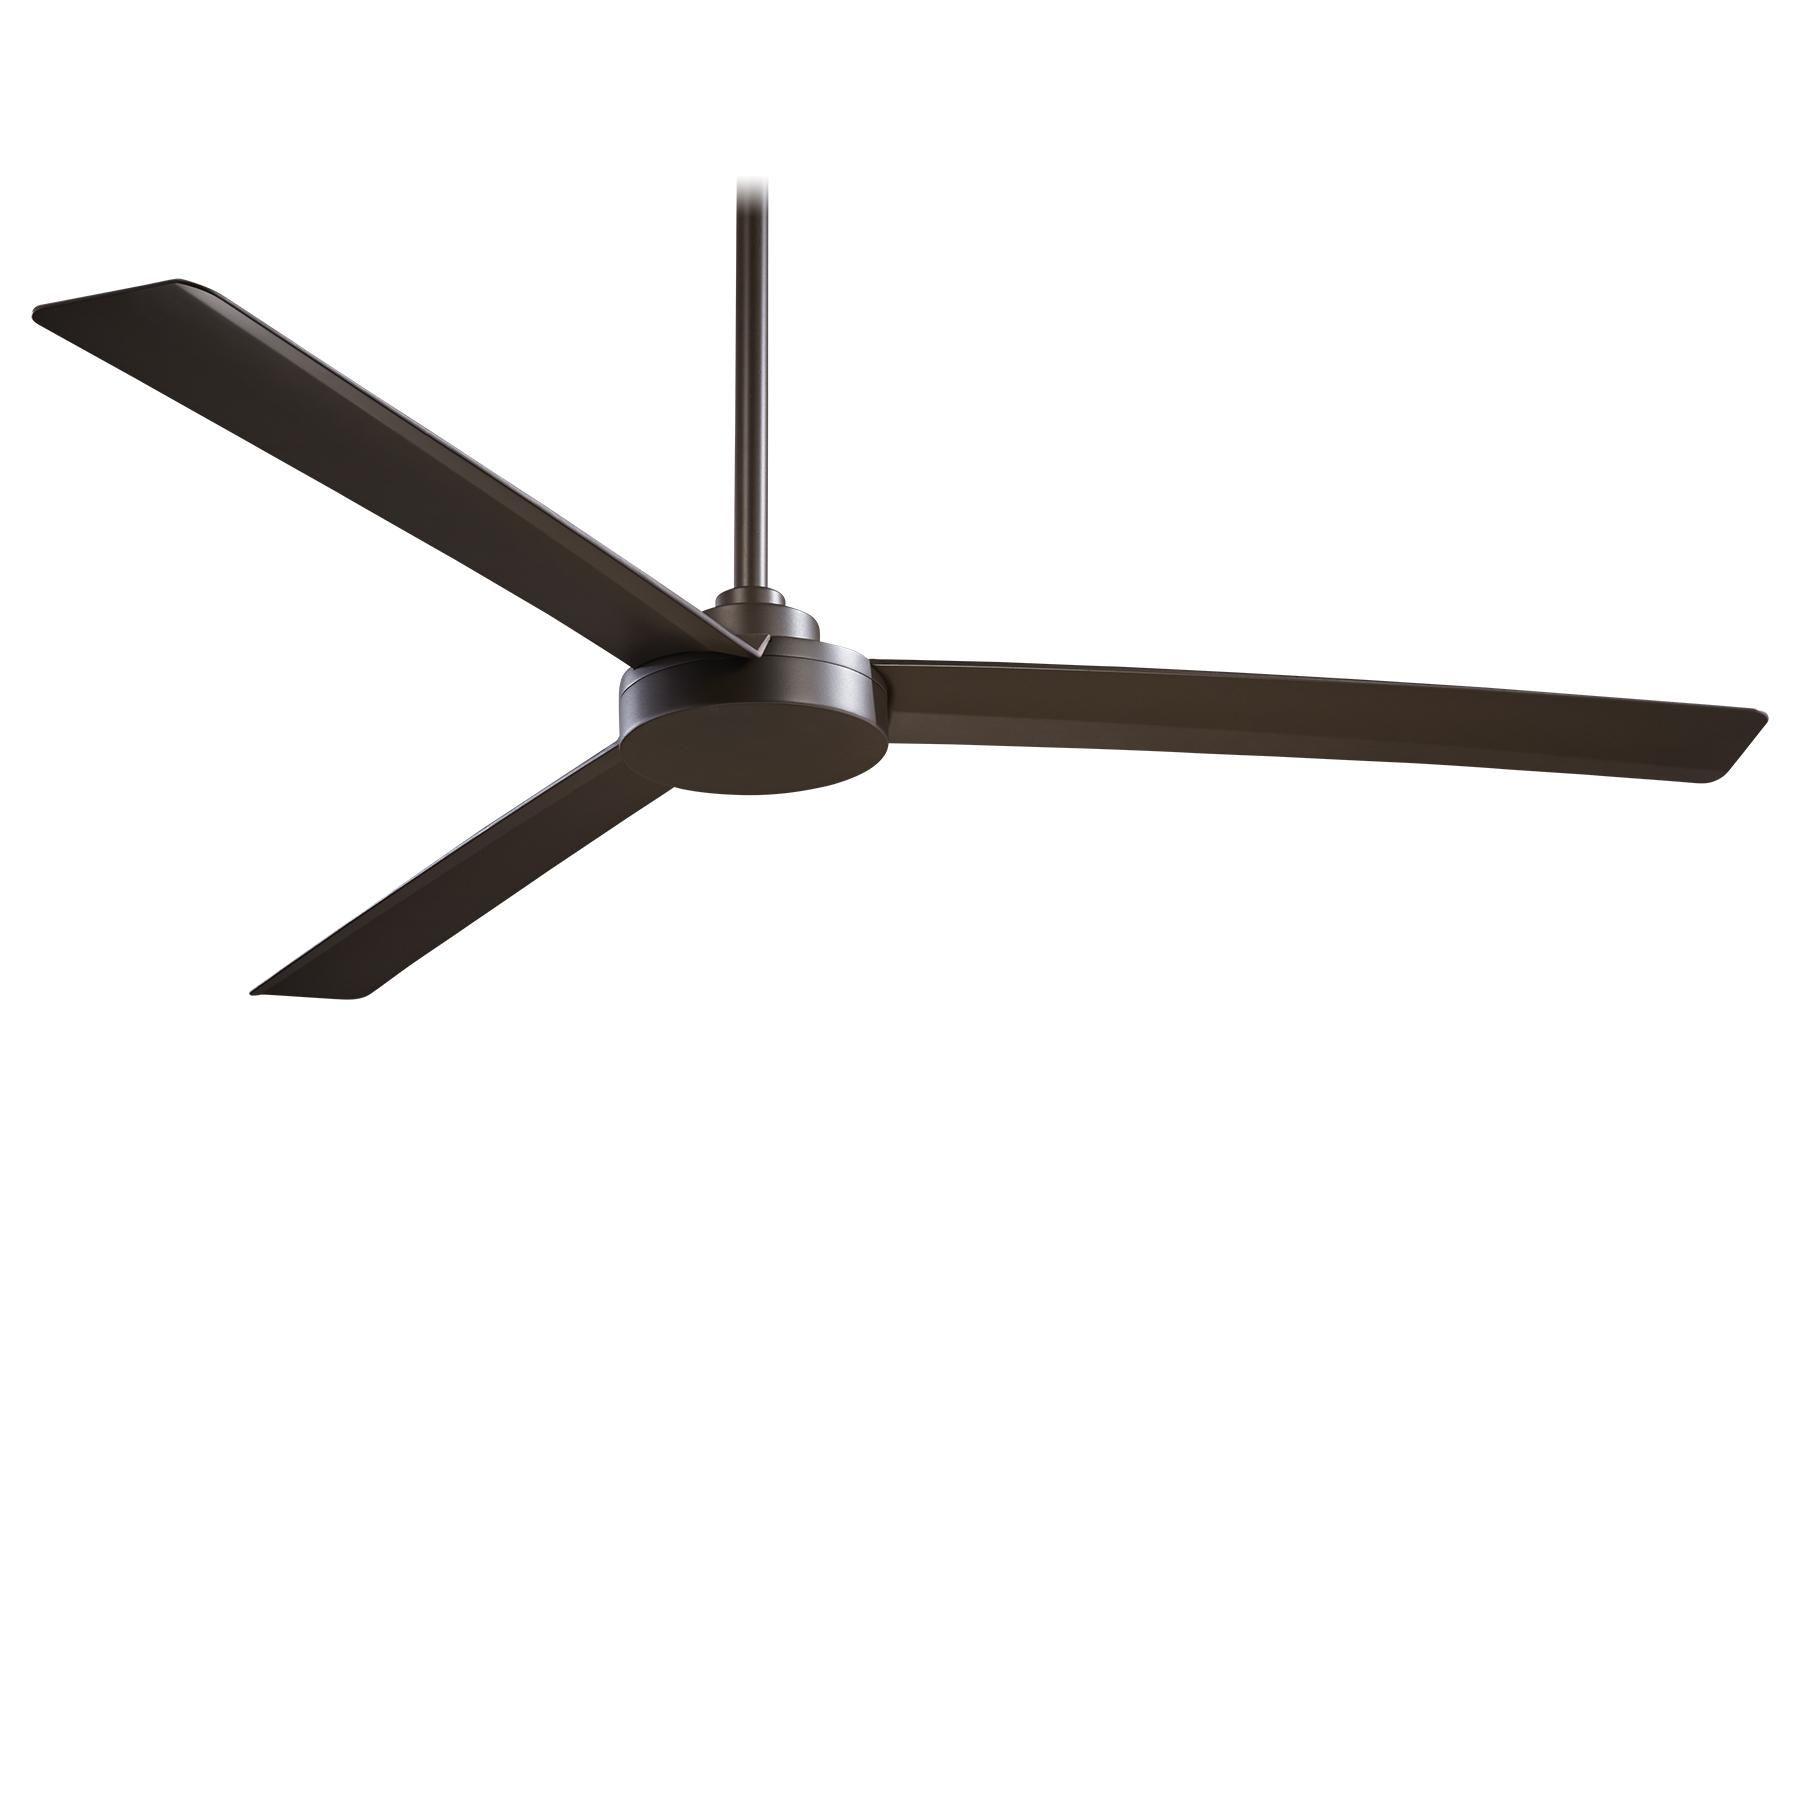 Roto Xl Indoor Outdoor Ceiling Fan By Minka Aire F624 Orb Ceiling Fan Minka Aire Ceiling Fan Bedroom